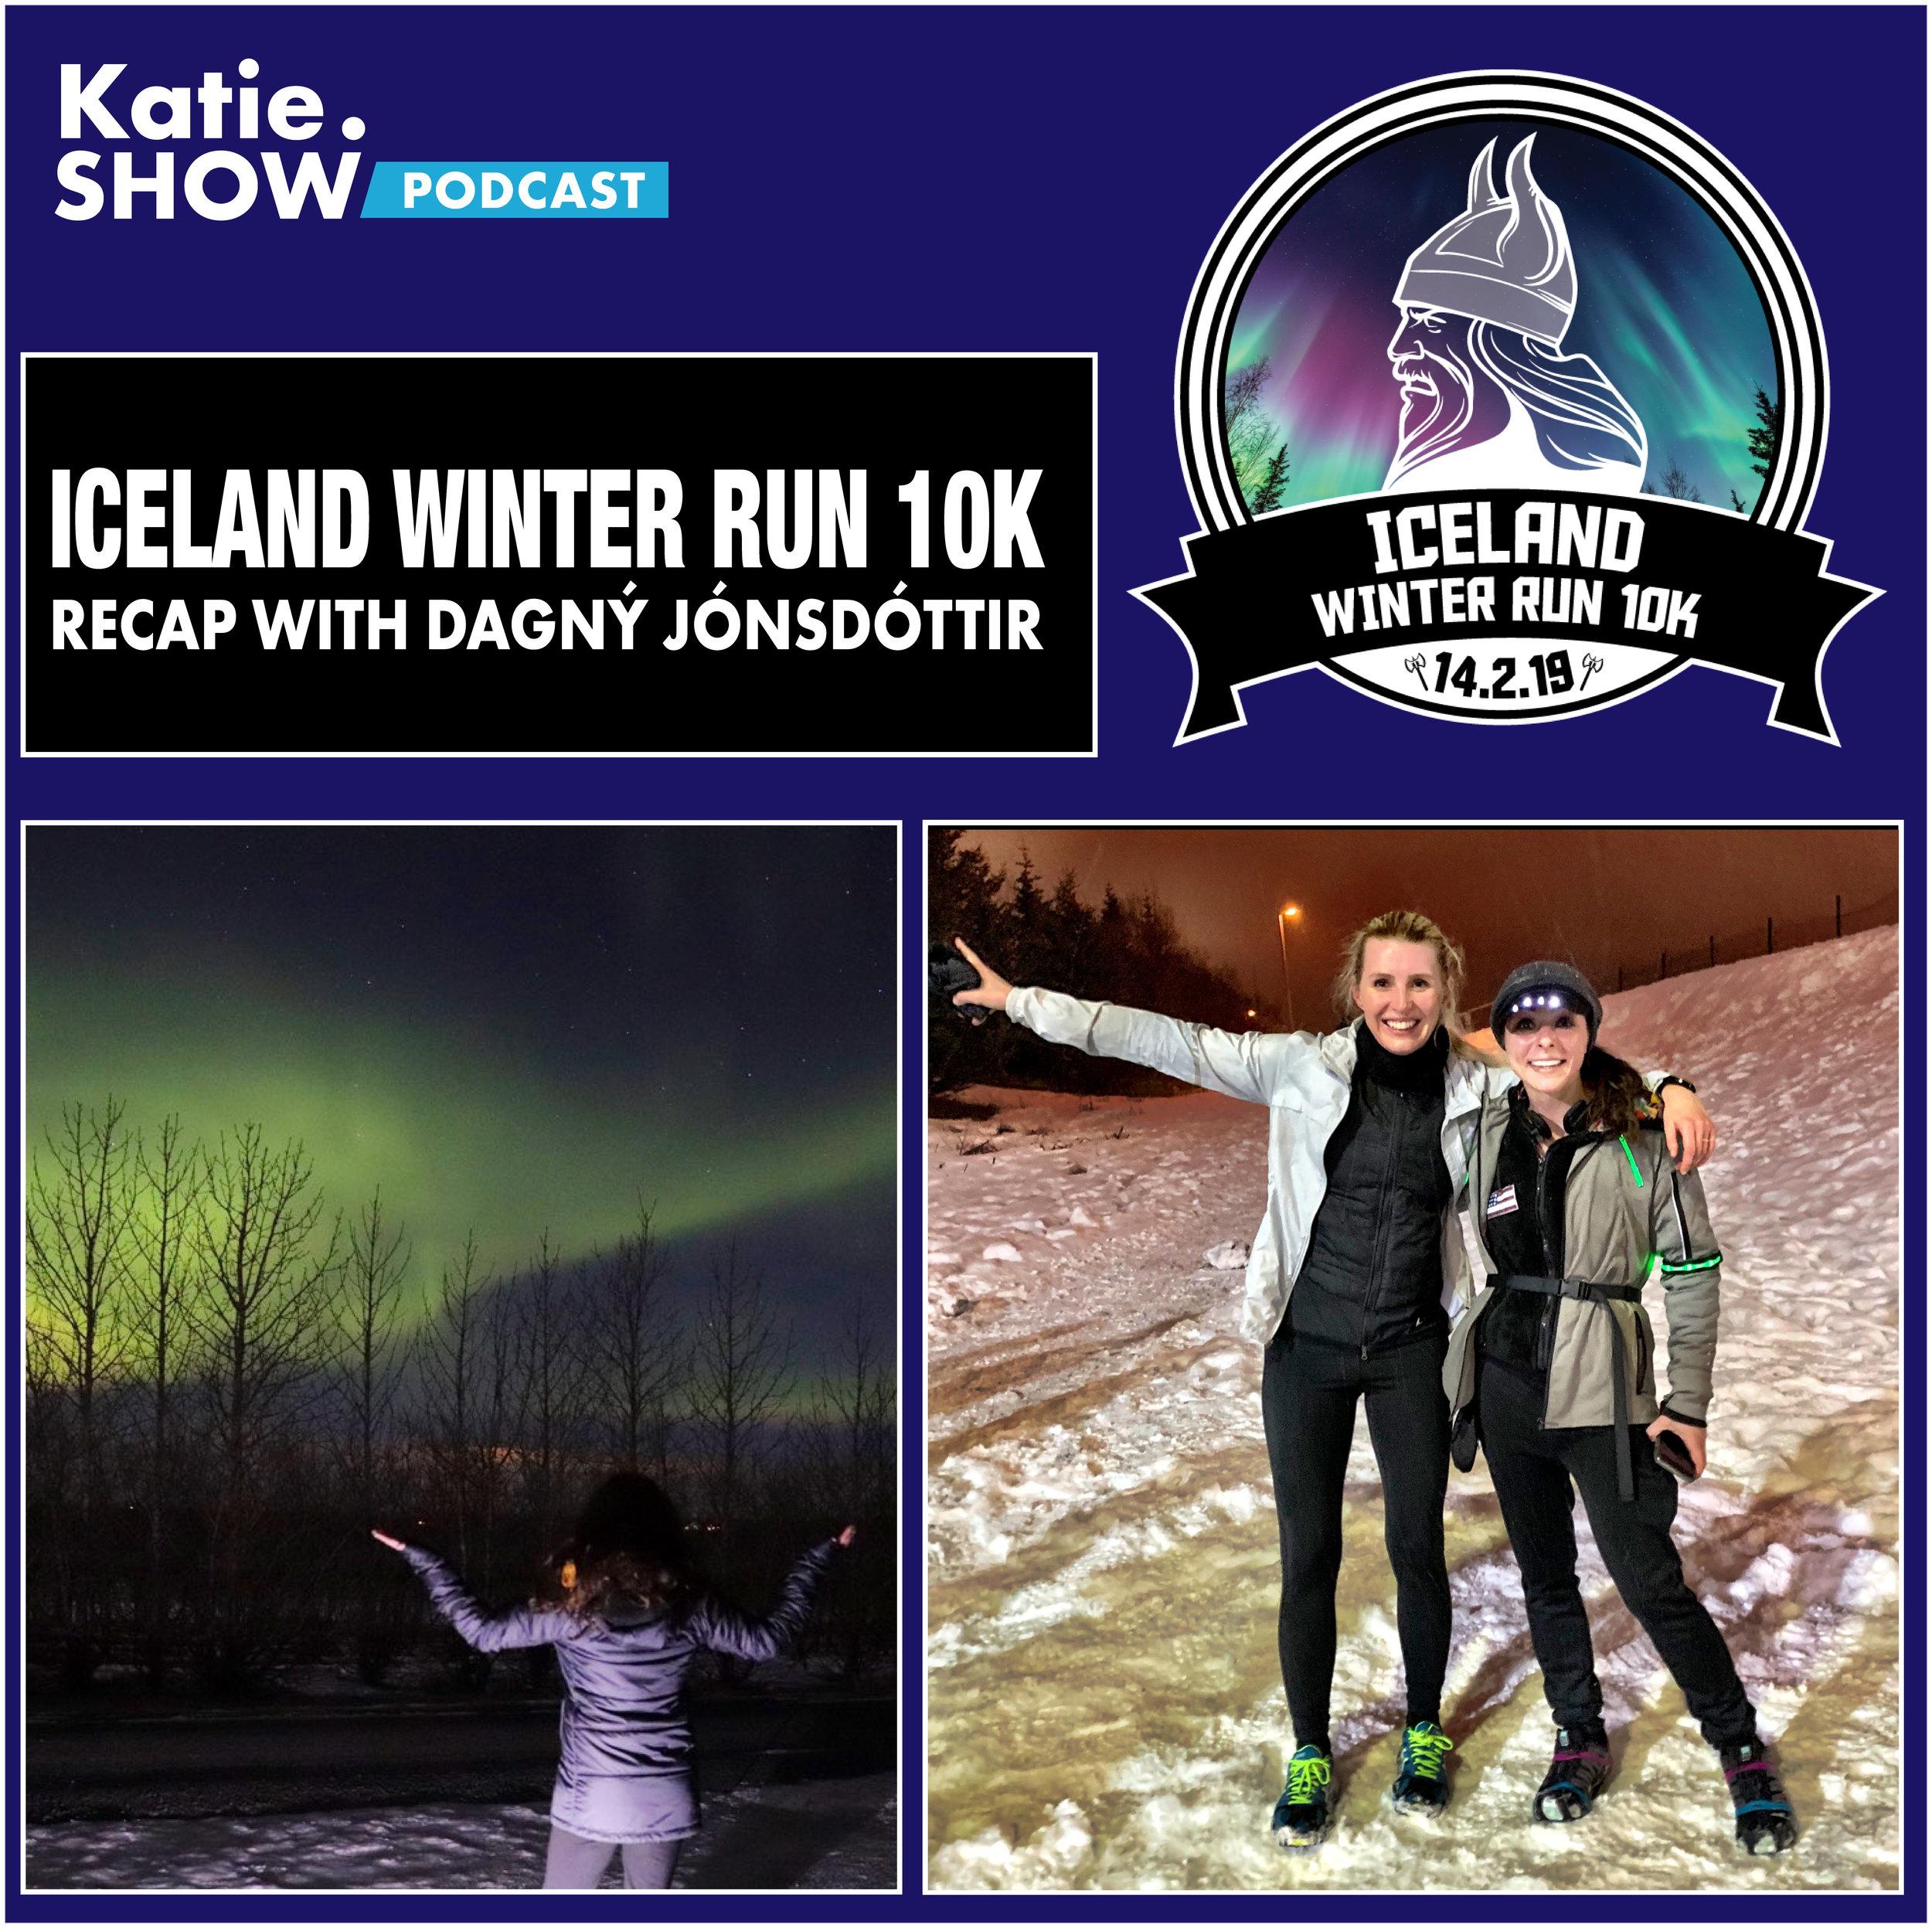 Copy of Iceland Winter Run 10k